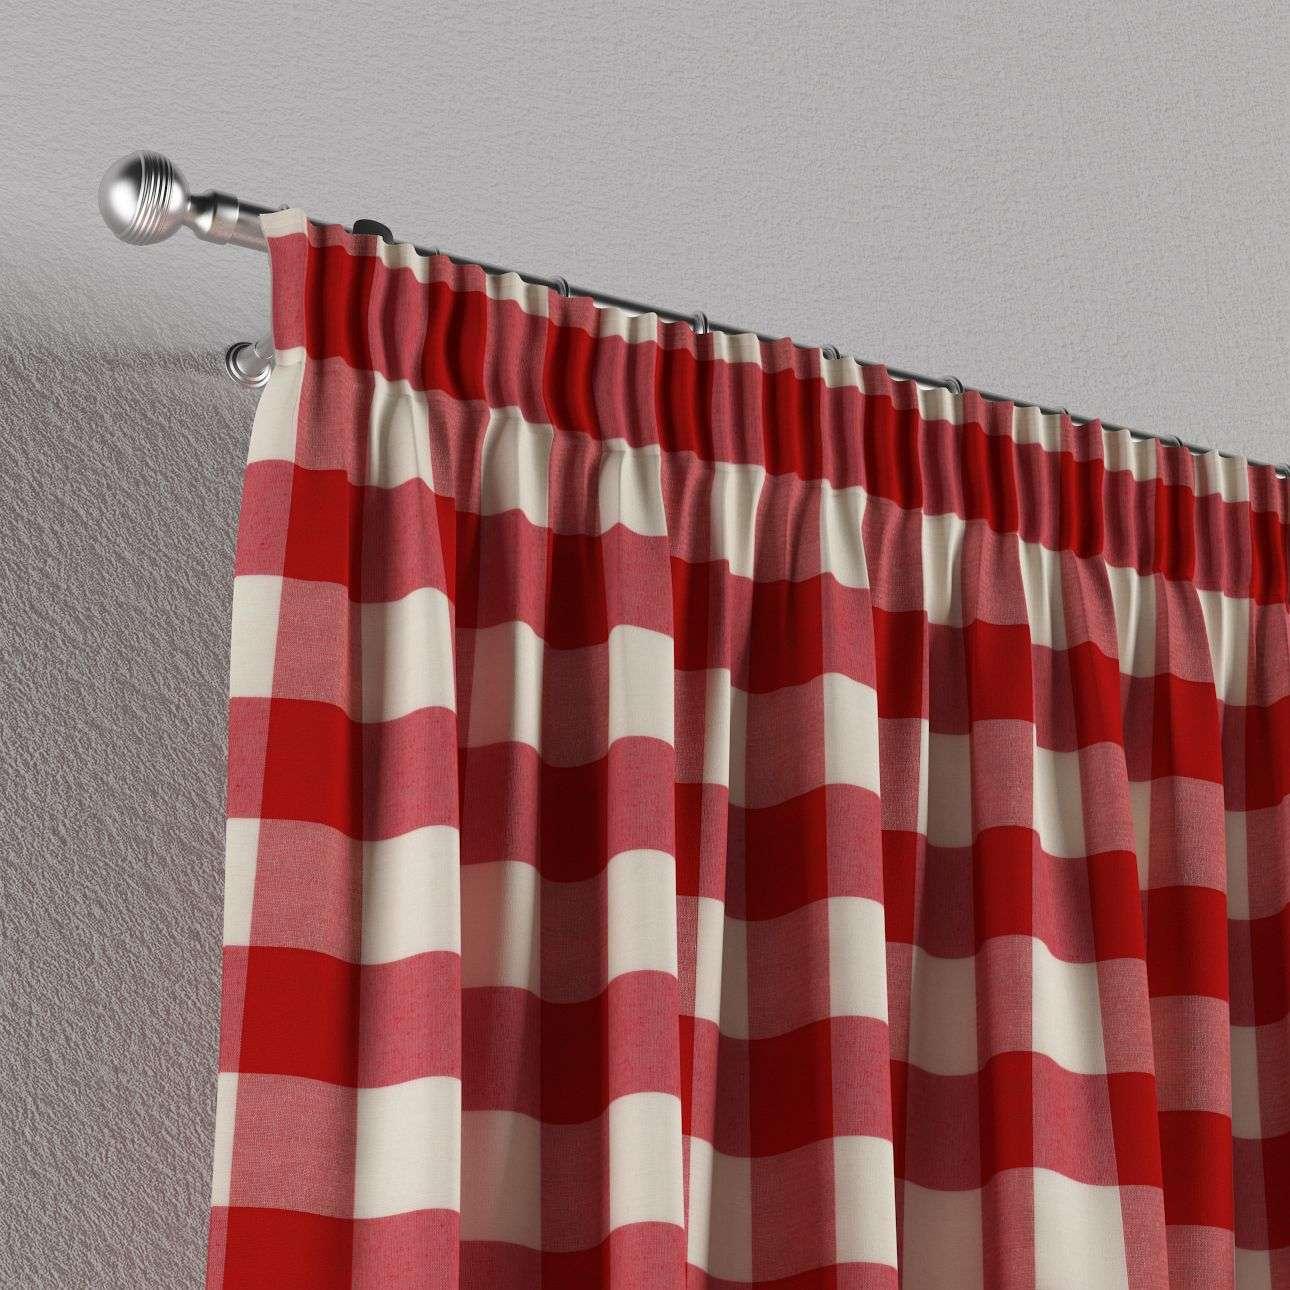 vorhang mit kr uselband weiss rot kariert dekoria. Black Bedroom Furniture Sets. Home Design Ideas